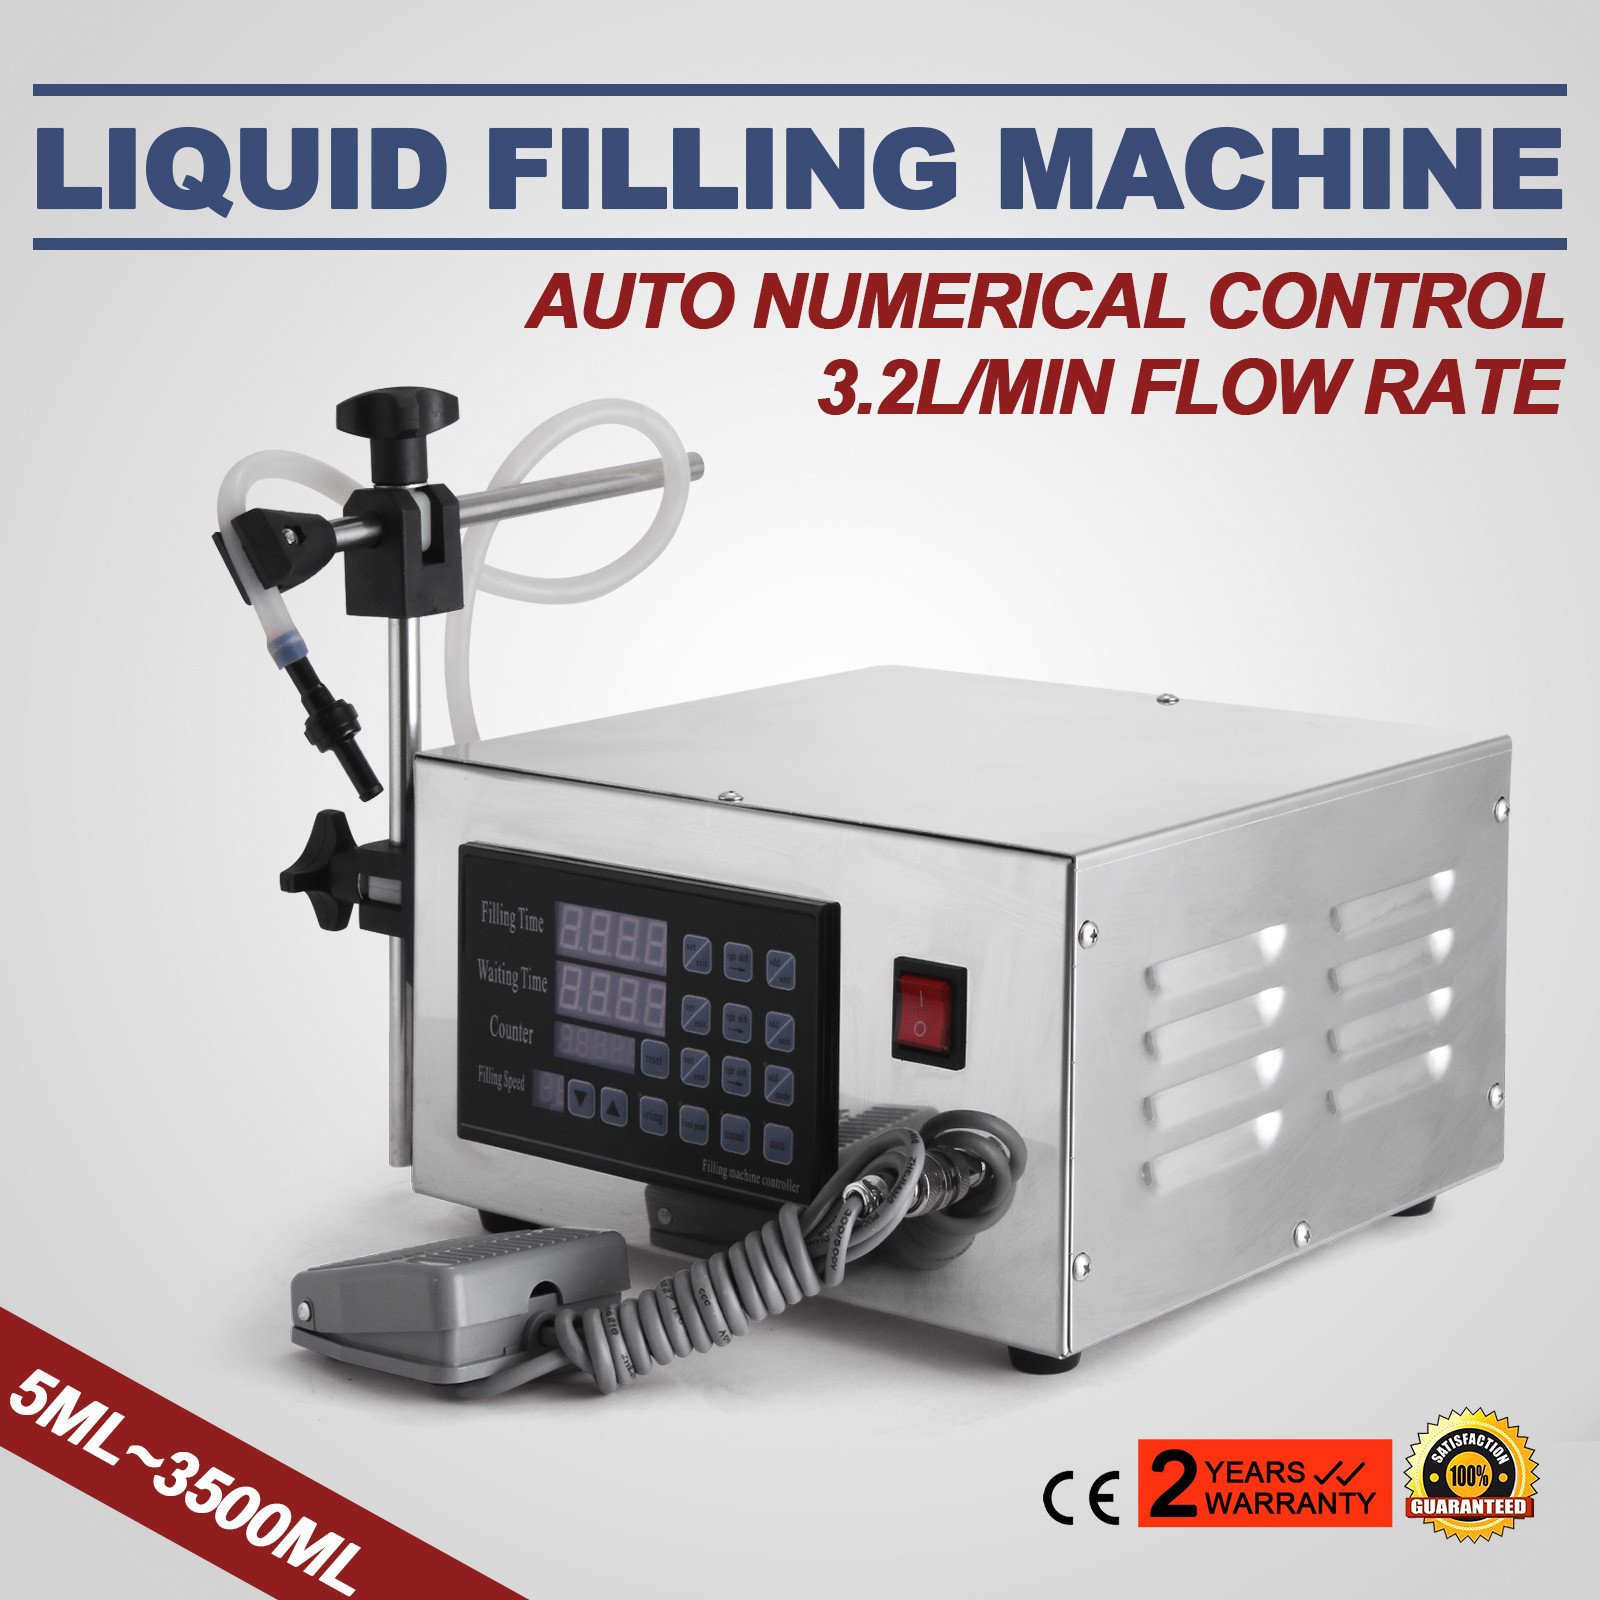 Liquid-Filling-Machine-Filler-Remplissage-2-3500ML-50-500ML-INDUSTRY-SUPPLY miniature 37